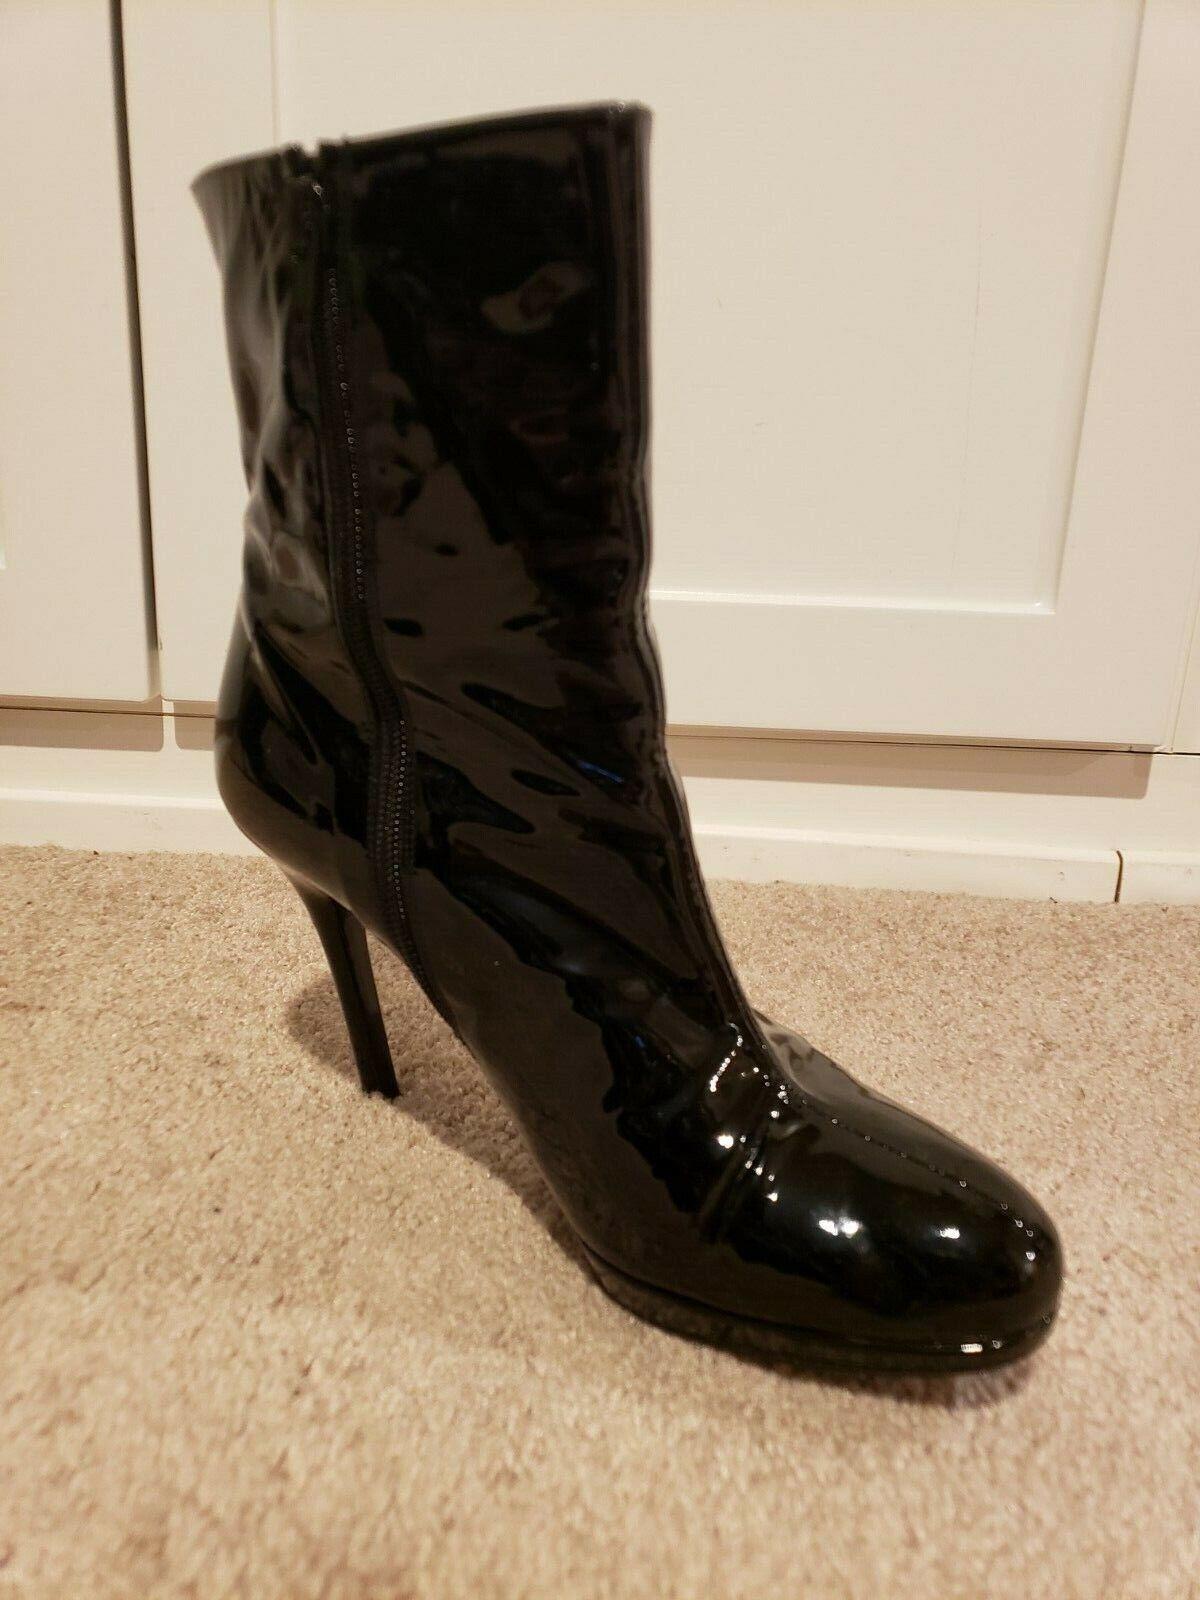 Stuart Weitzman Apollo Black Patent Leather Boots Size 8